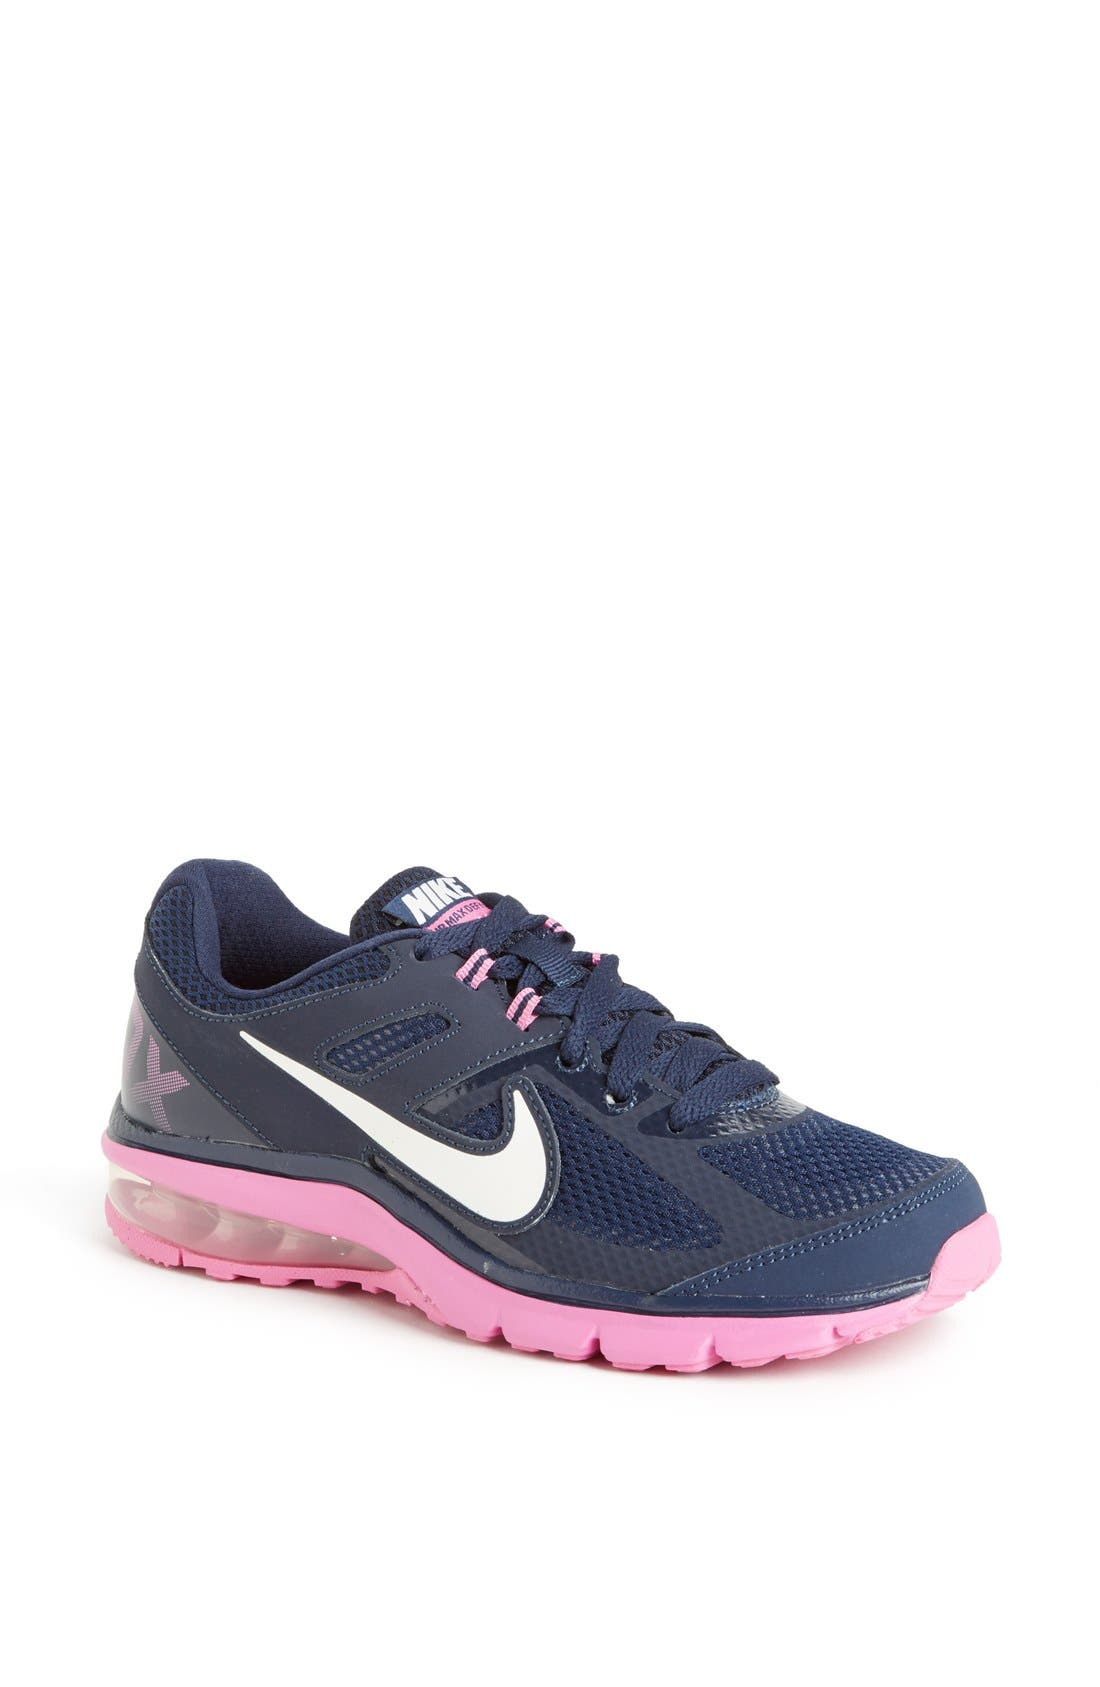 Main Image - Nike 'Air Max Defy' Running Shoe (Women)